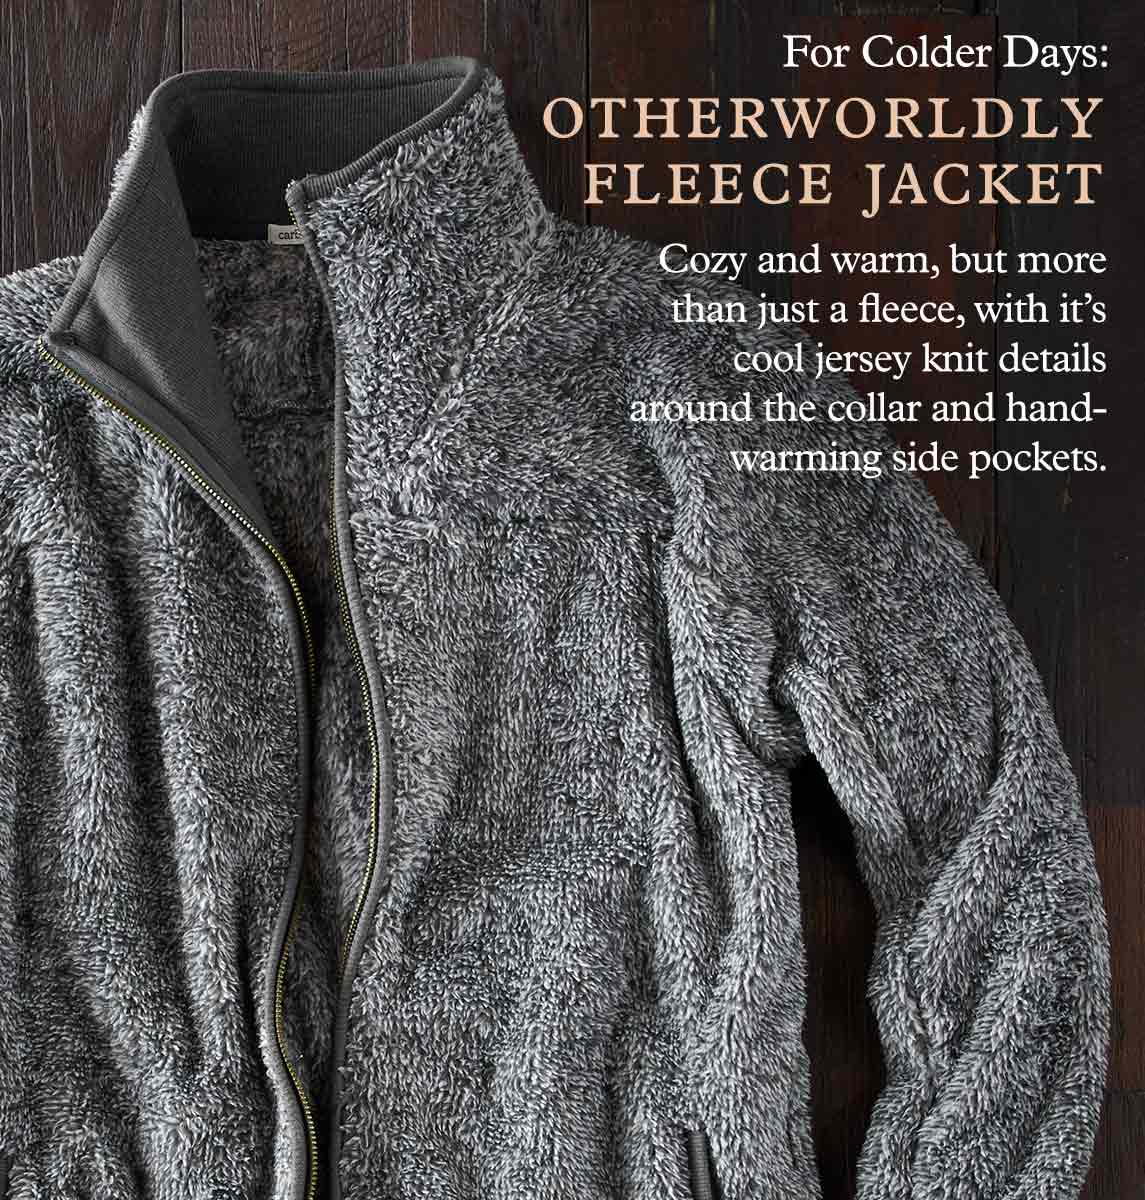 Otherworldly Fleece Jacket